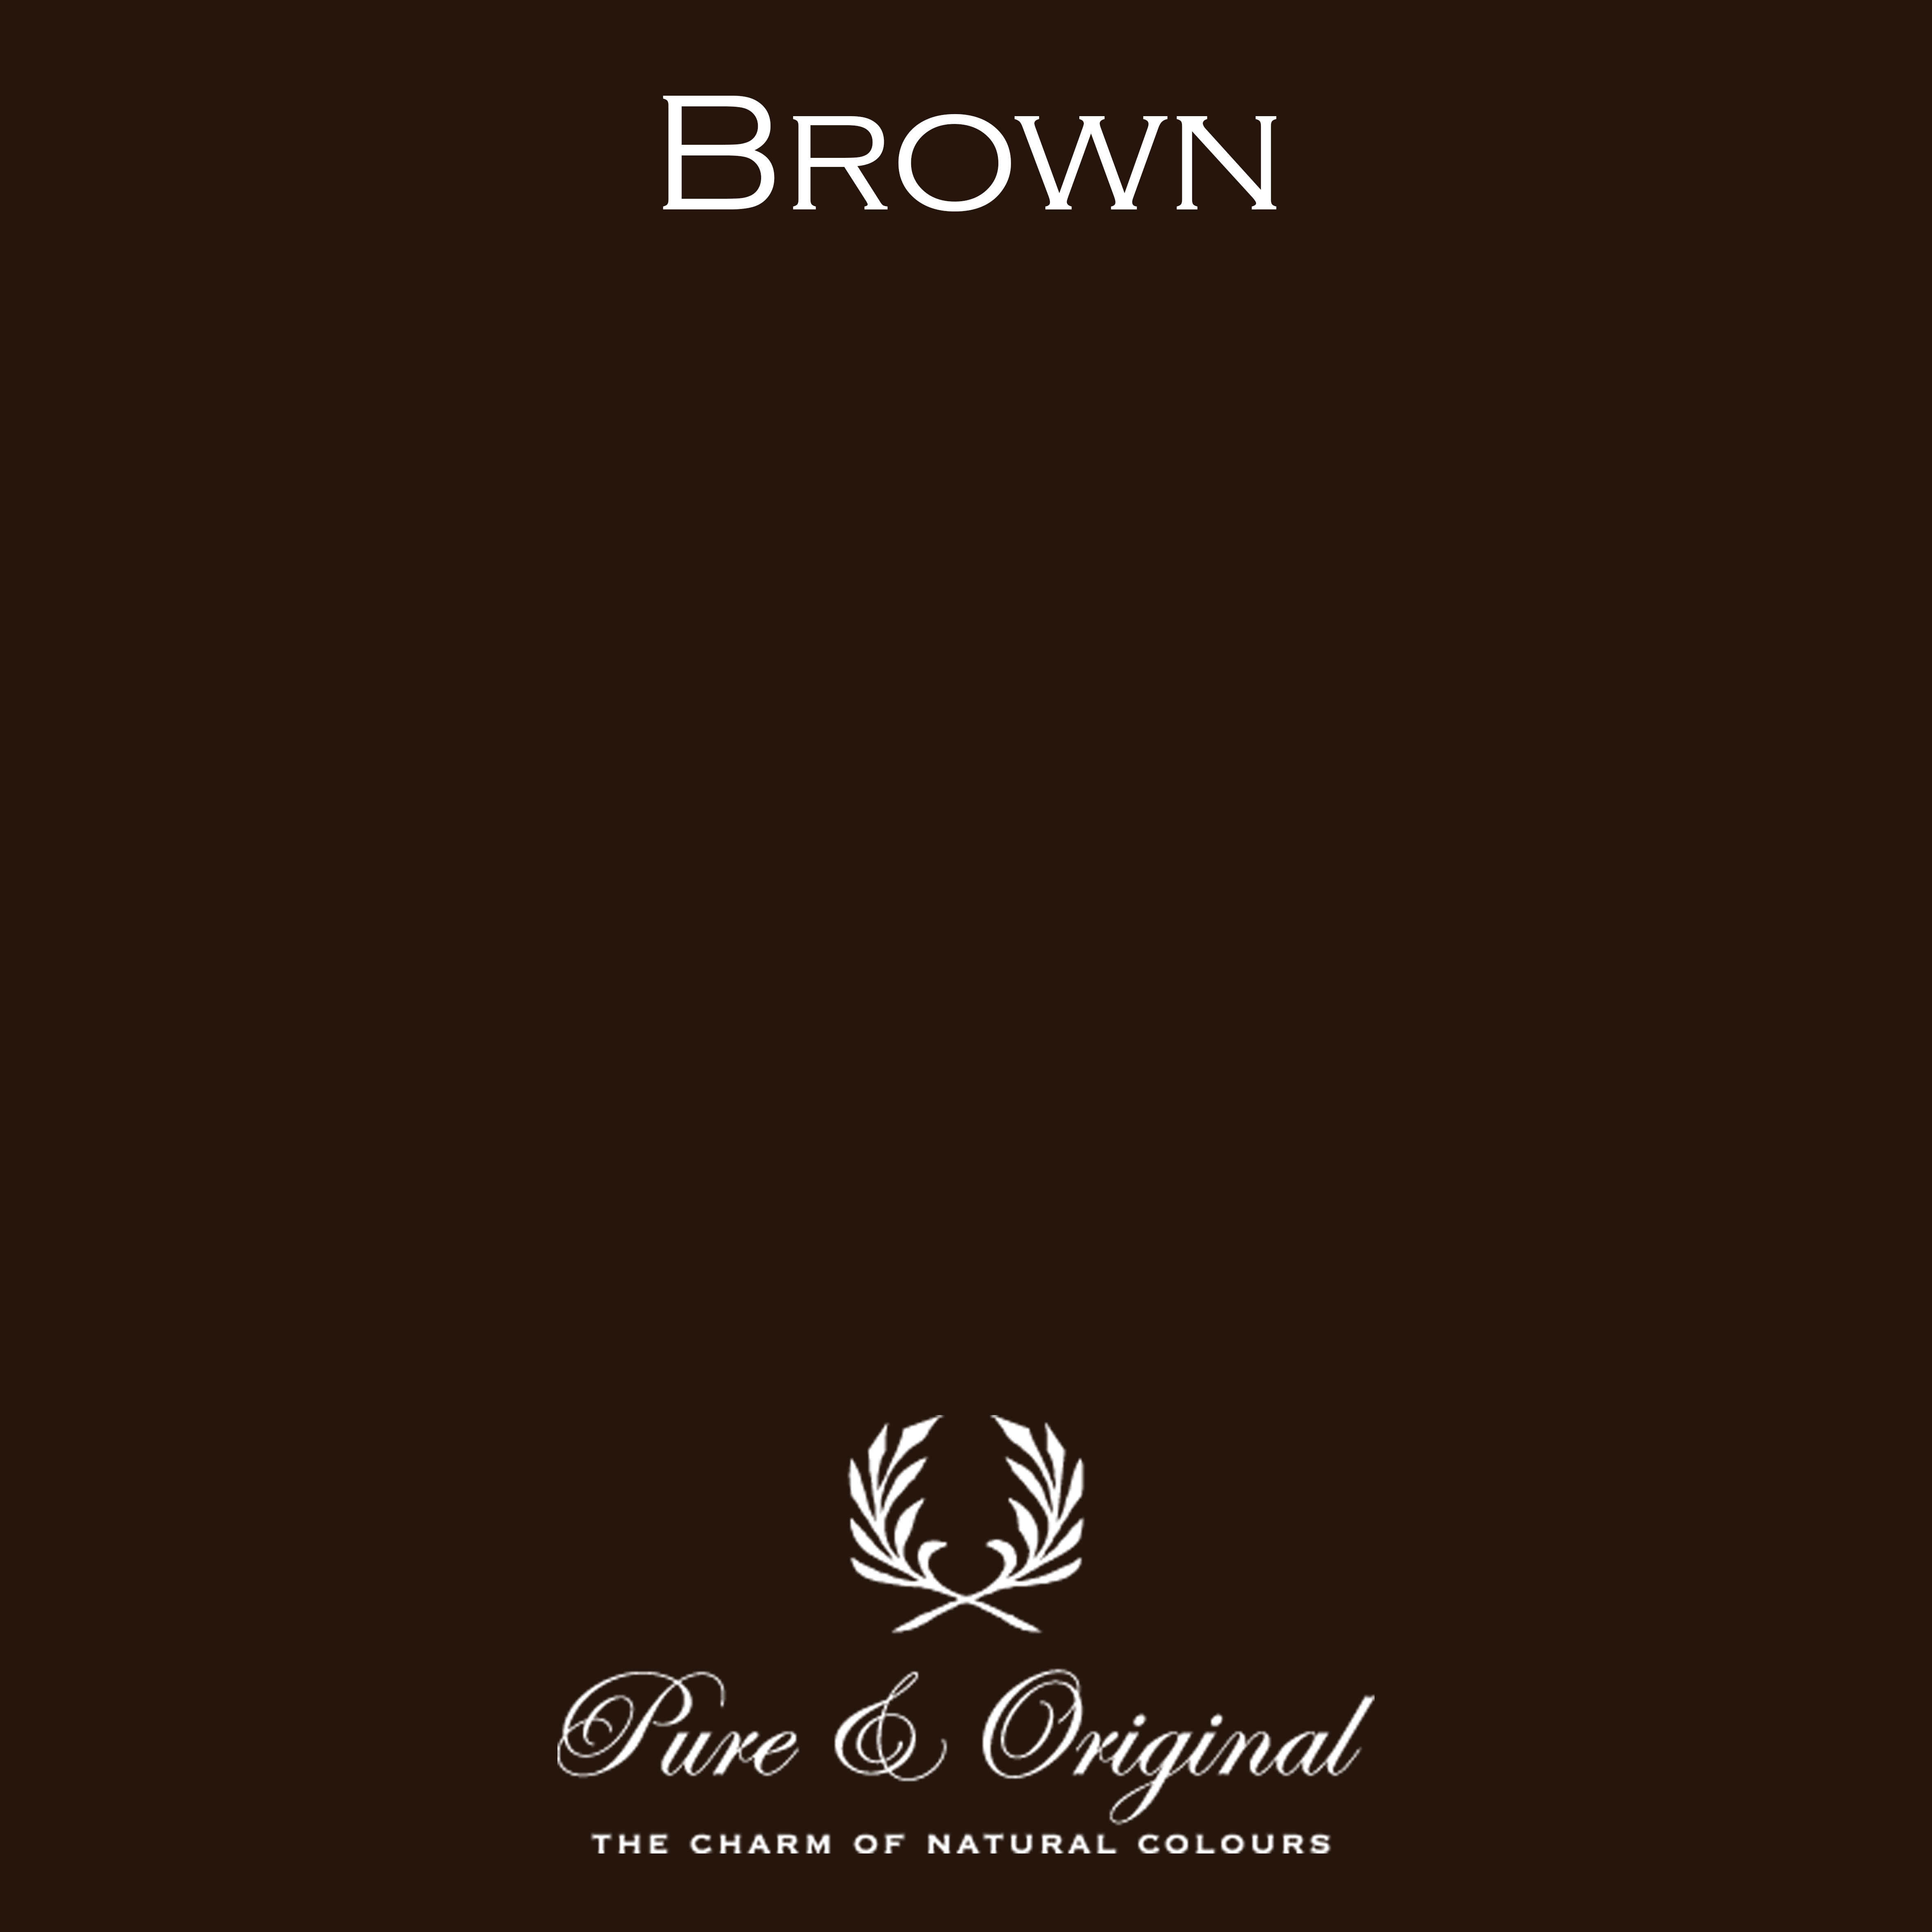 Kulör Brown, Classico kritfärg